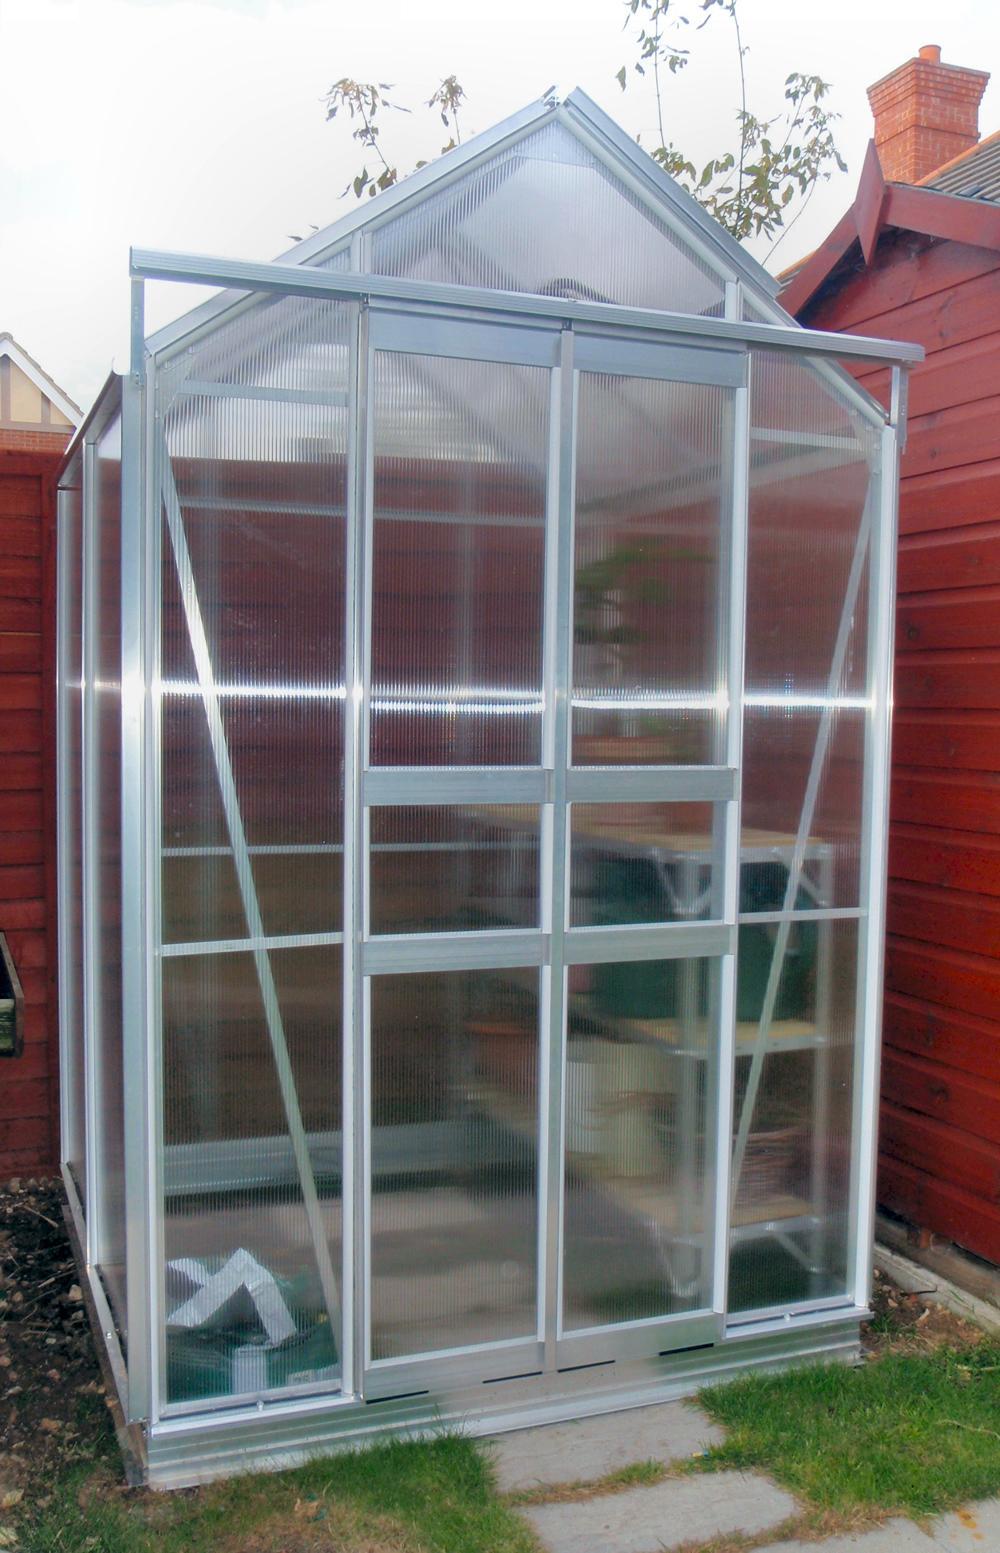 Simplicity Sandon Polycarbonate 4x4 greenhouse